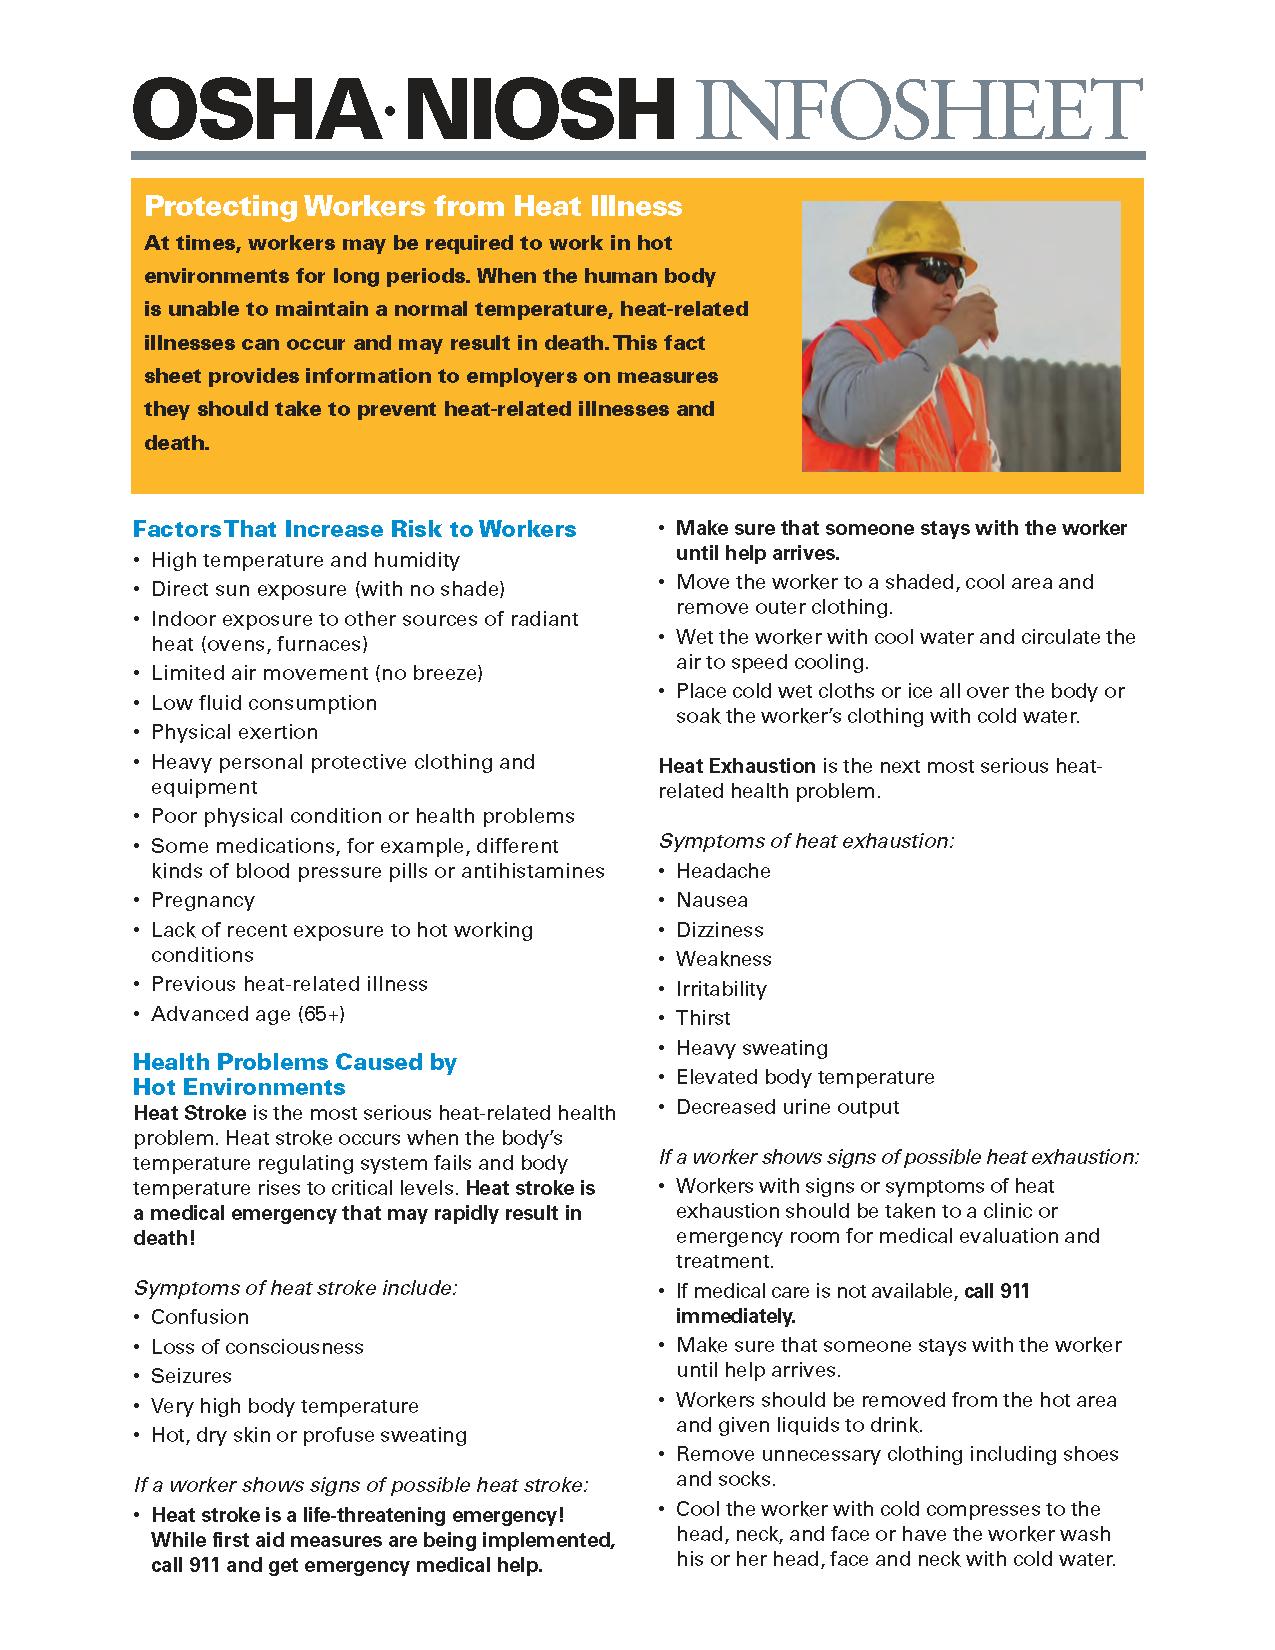 http://www.ibew683.org/Uploads/UploadedFiles/2019_OSHA_Heat_Stress_Fact_Sheet_Page_1